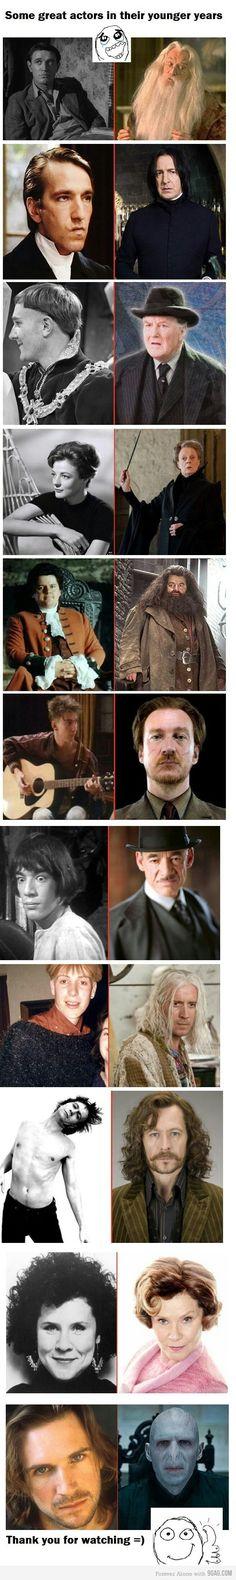 Snape, Voldemort, and Sirius.....